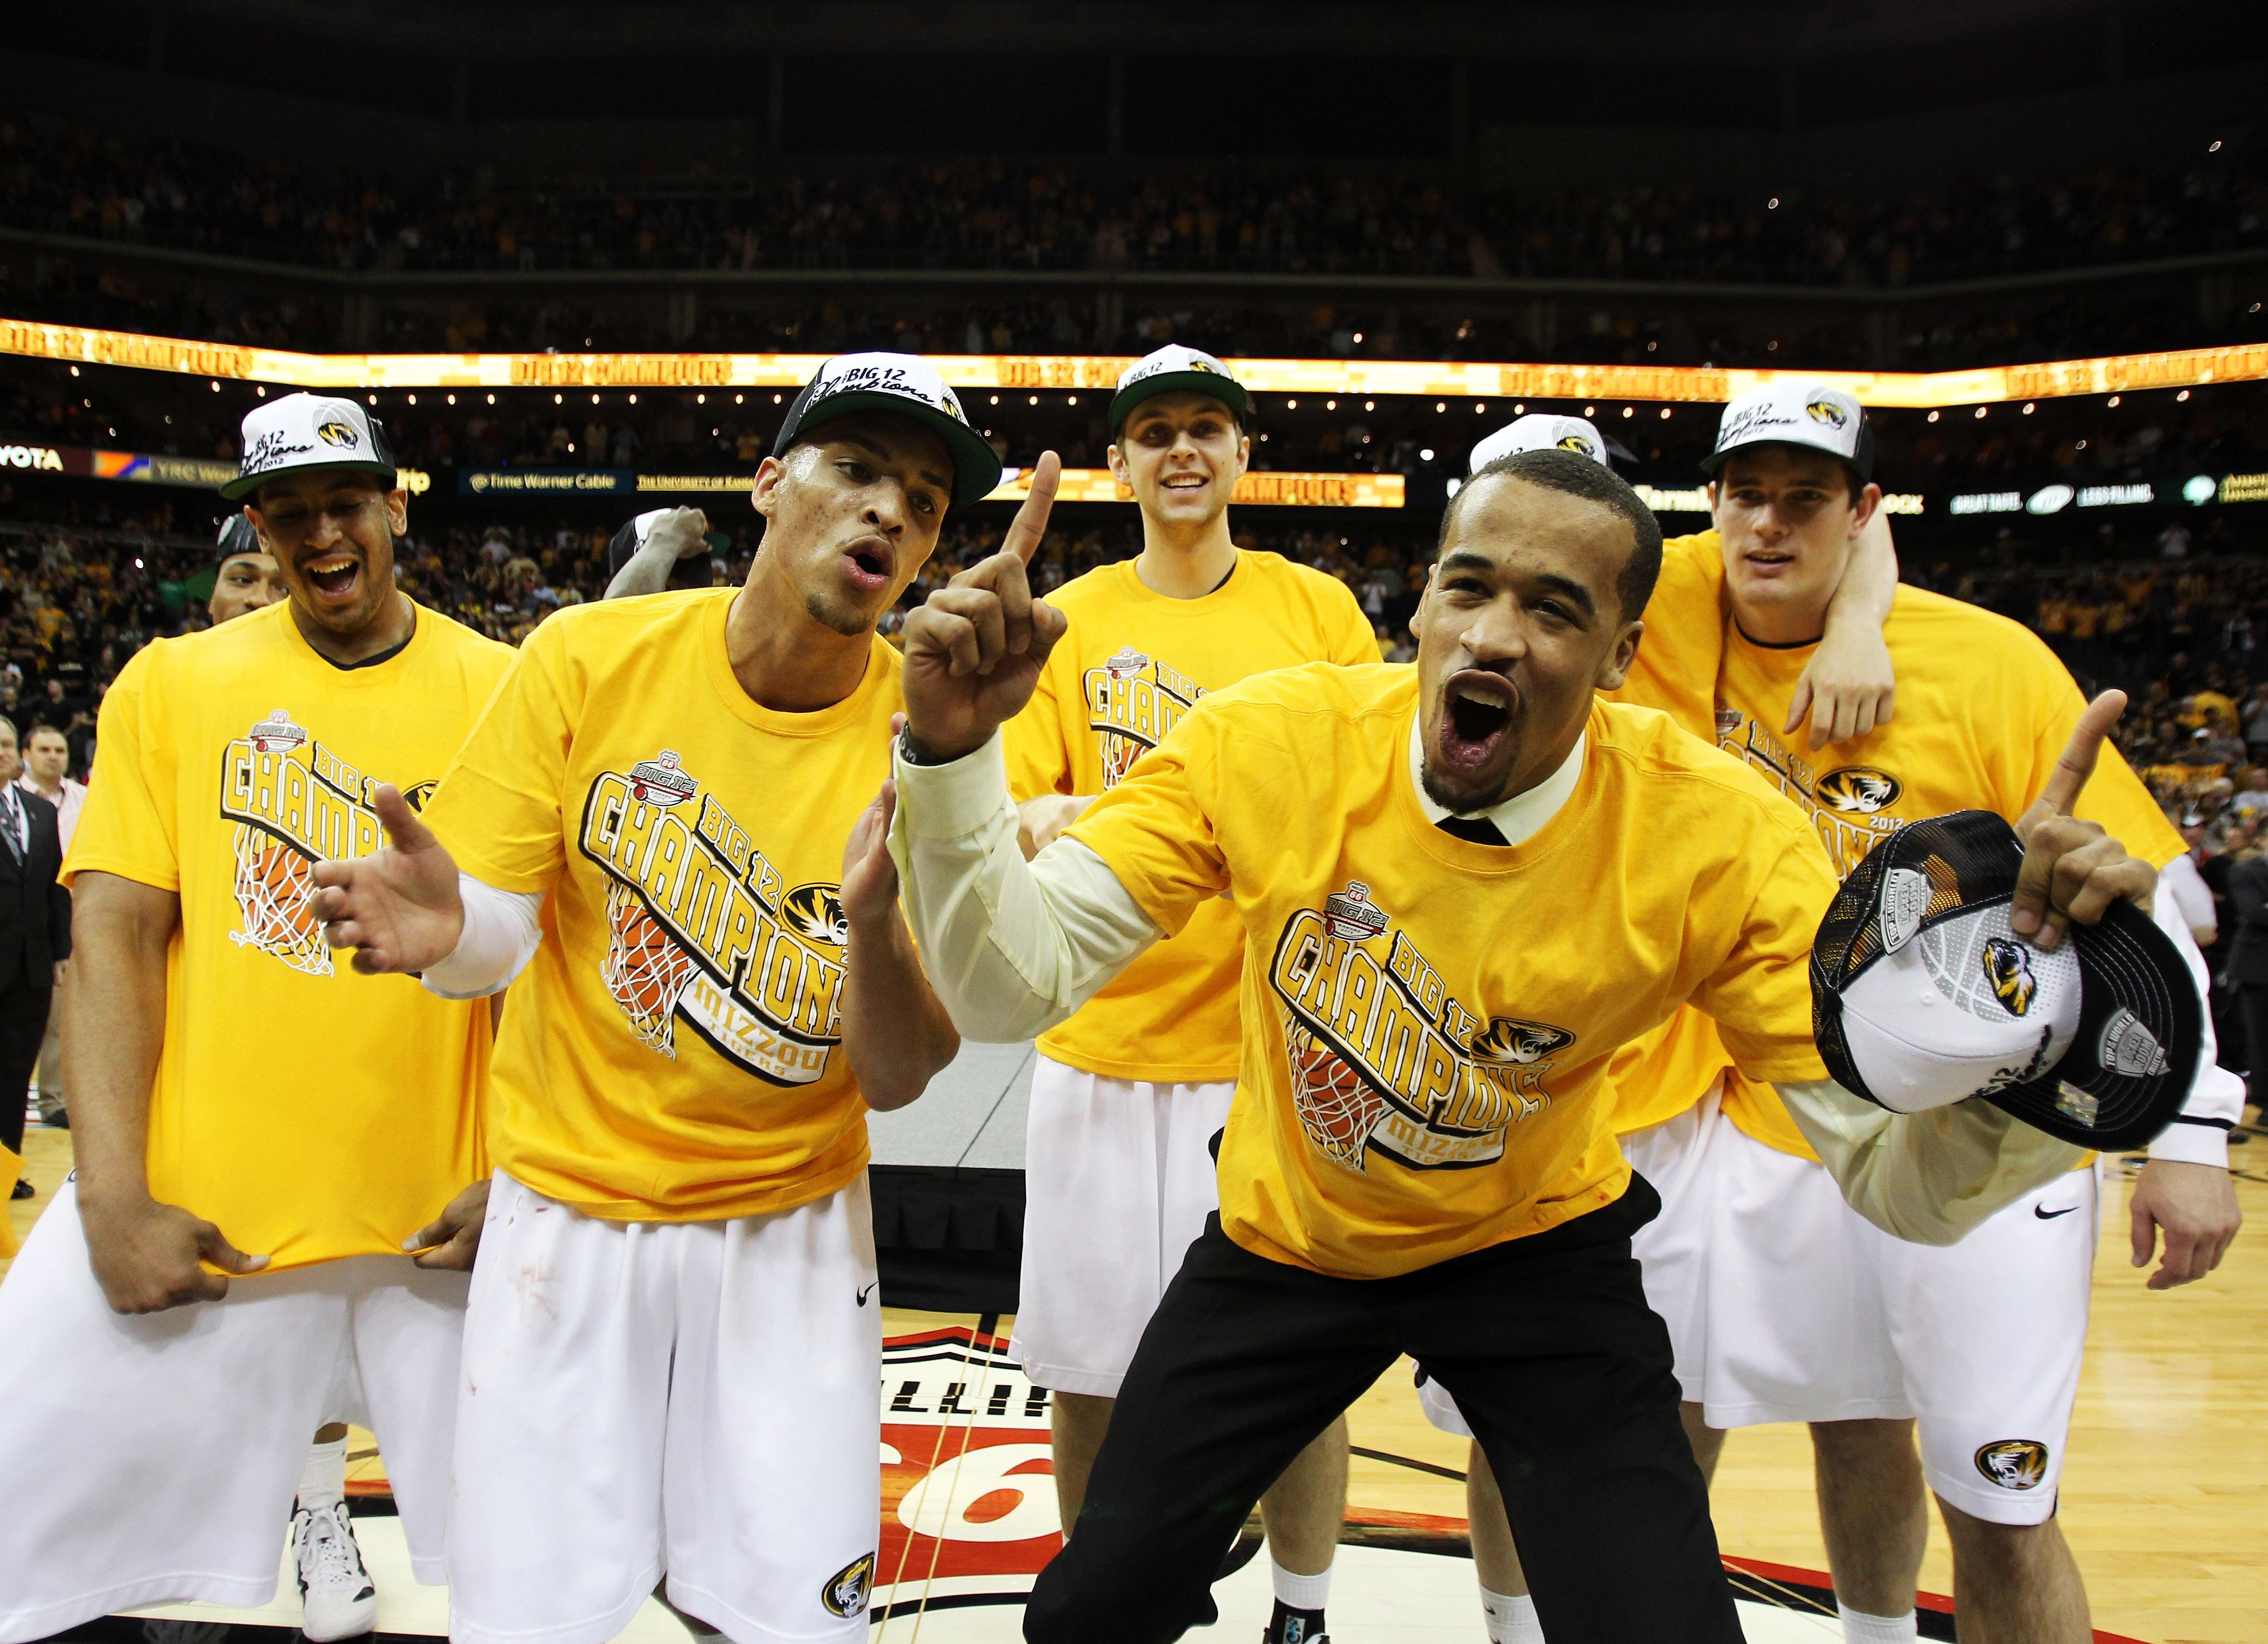 Big 12 Basketball Tournament - Baylor v Missouri